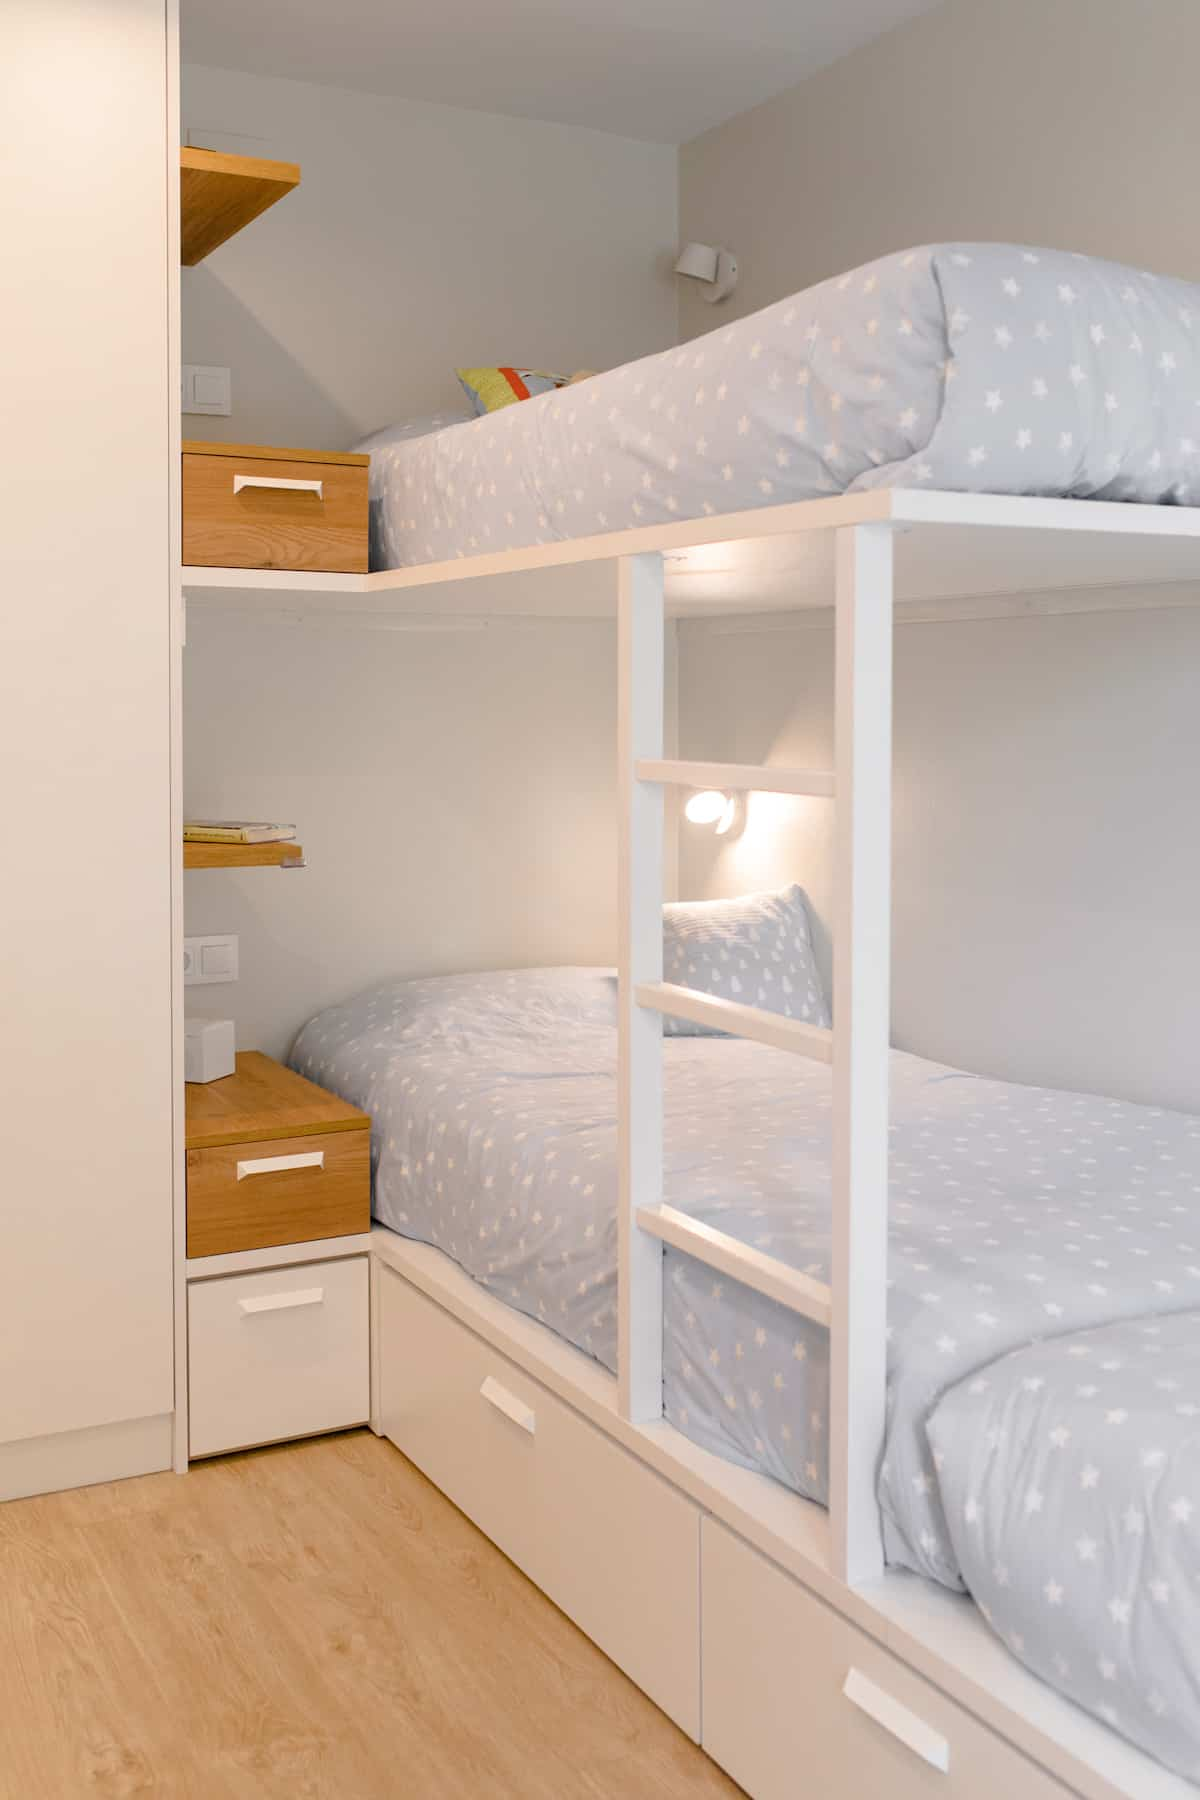 Detalle habitación infantil 3 camas